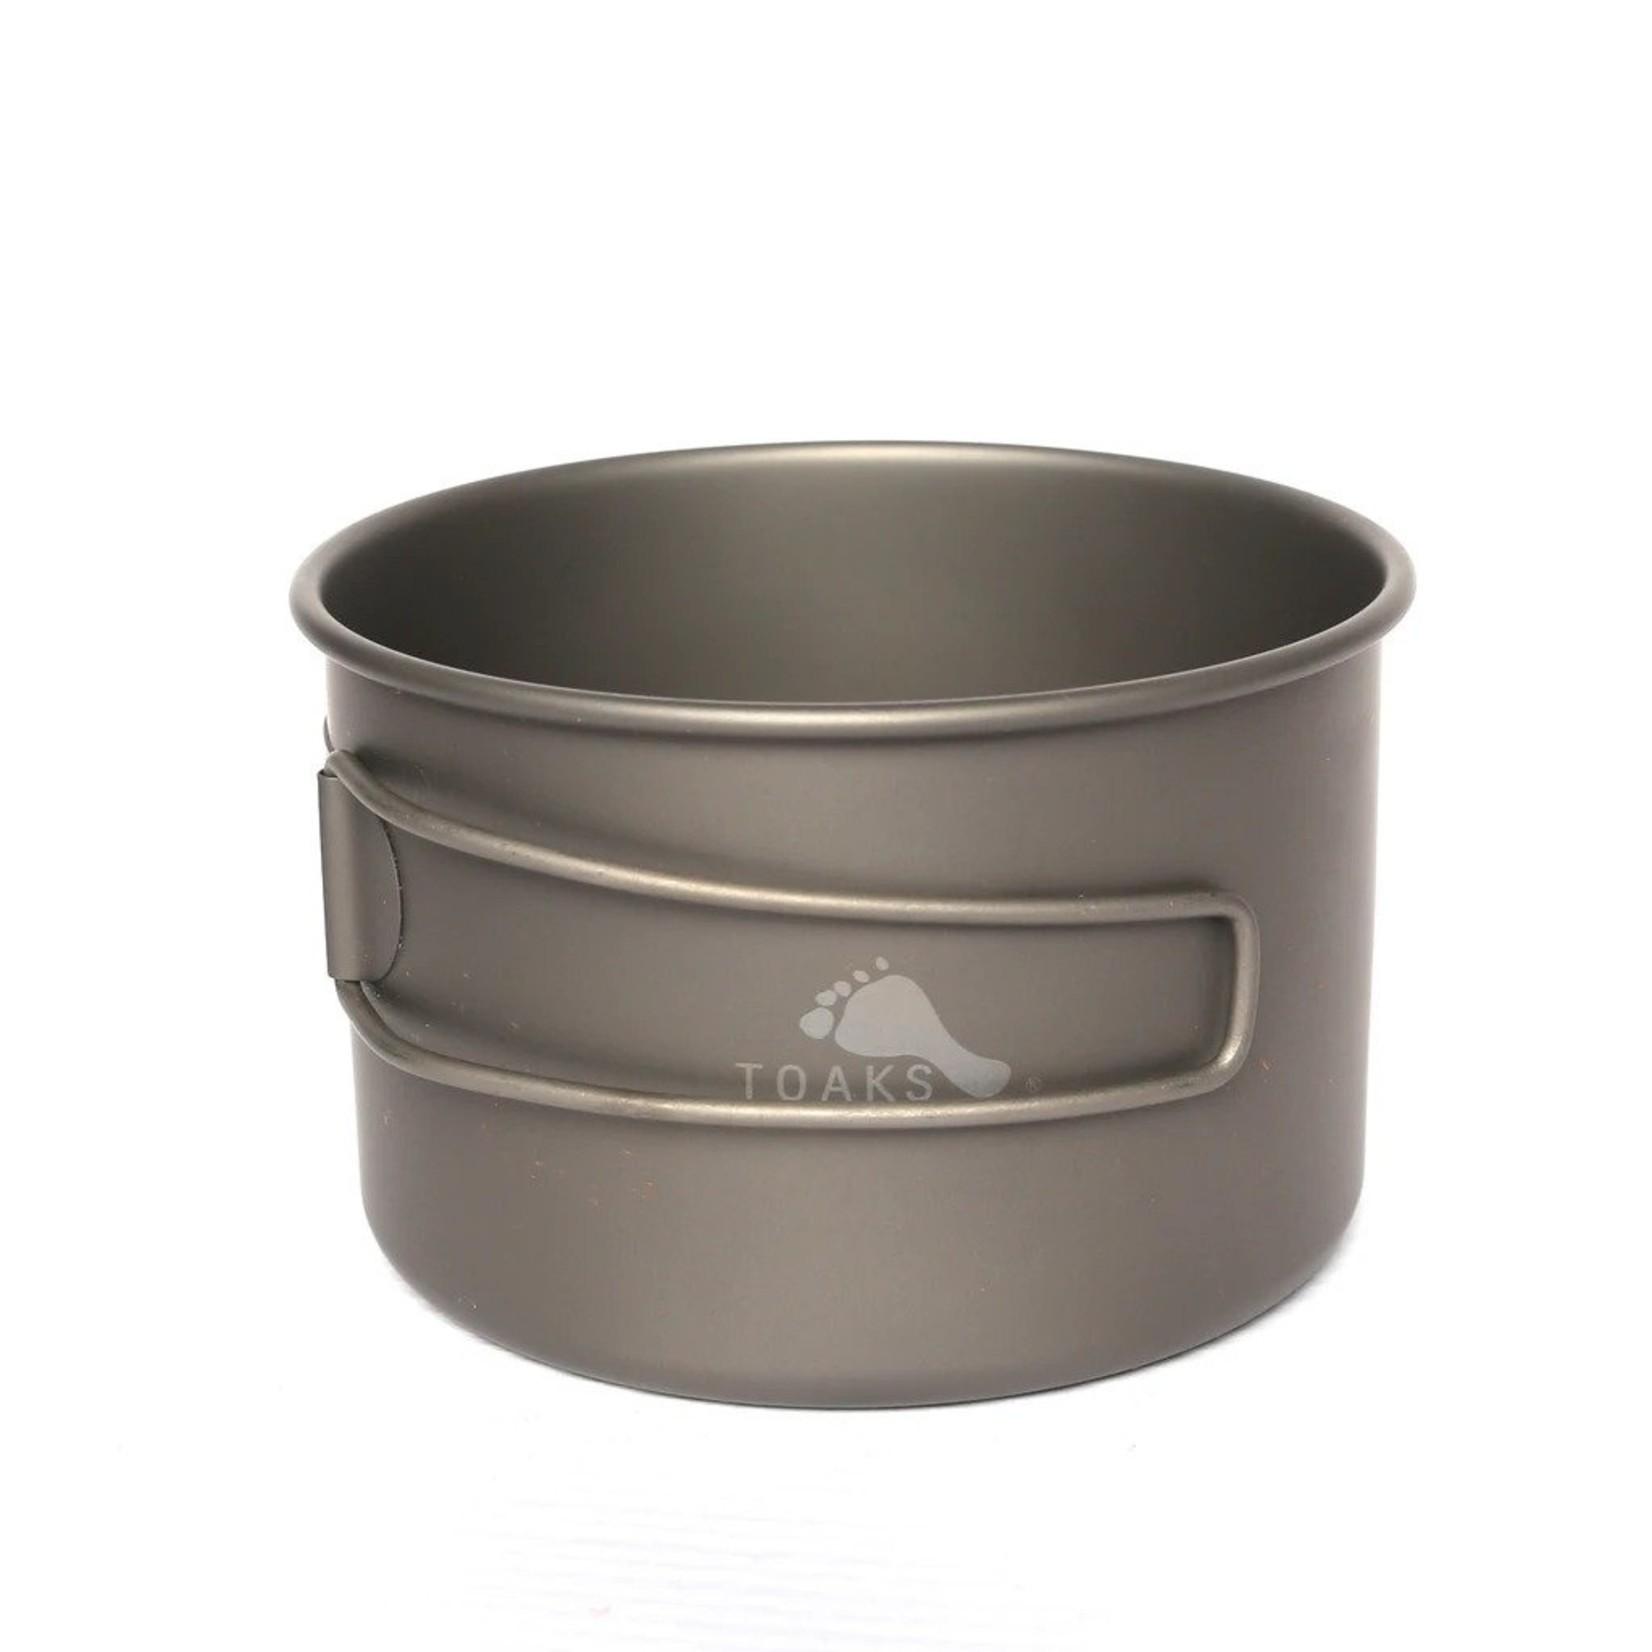 Toaks Toaks, Titanium 550ml Bowl